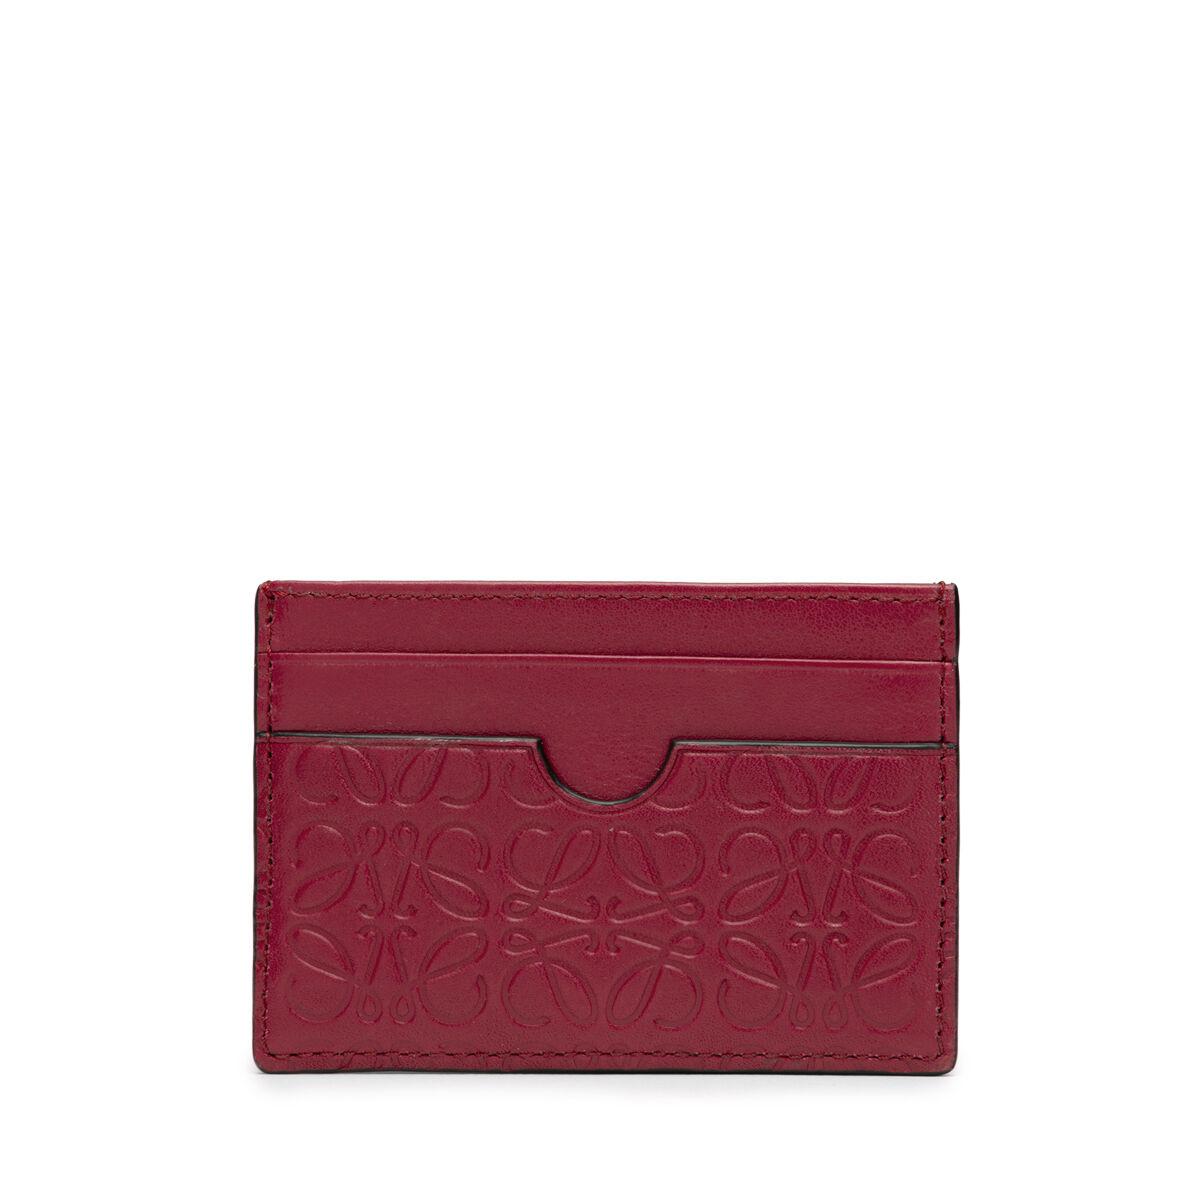 LOEWE Plain Card Holder 覆盆莓色 all